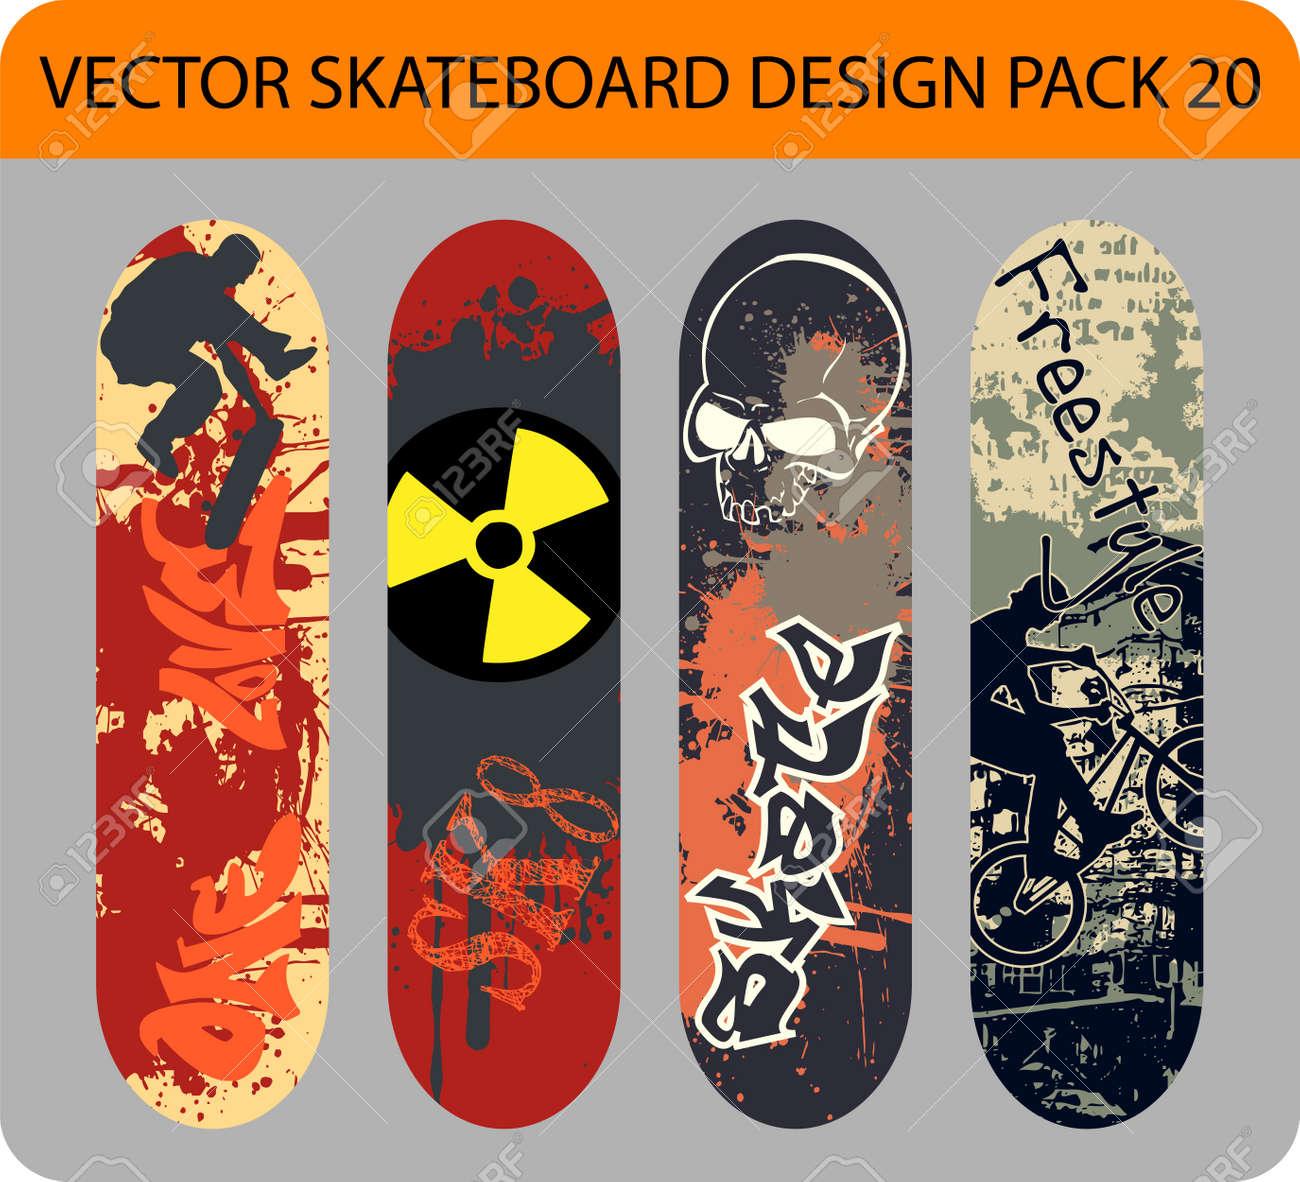 Grunge pack of 4 skateboard designs - 14201528